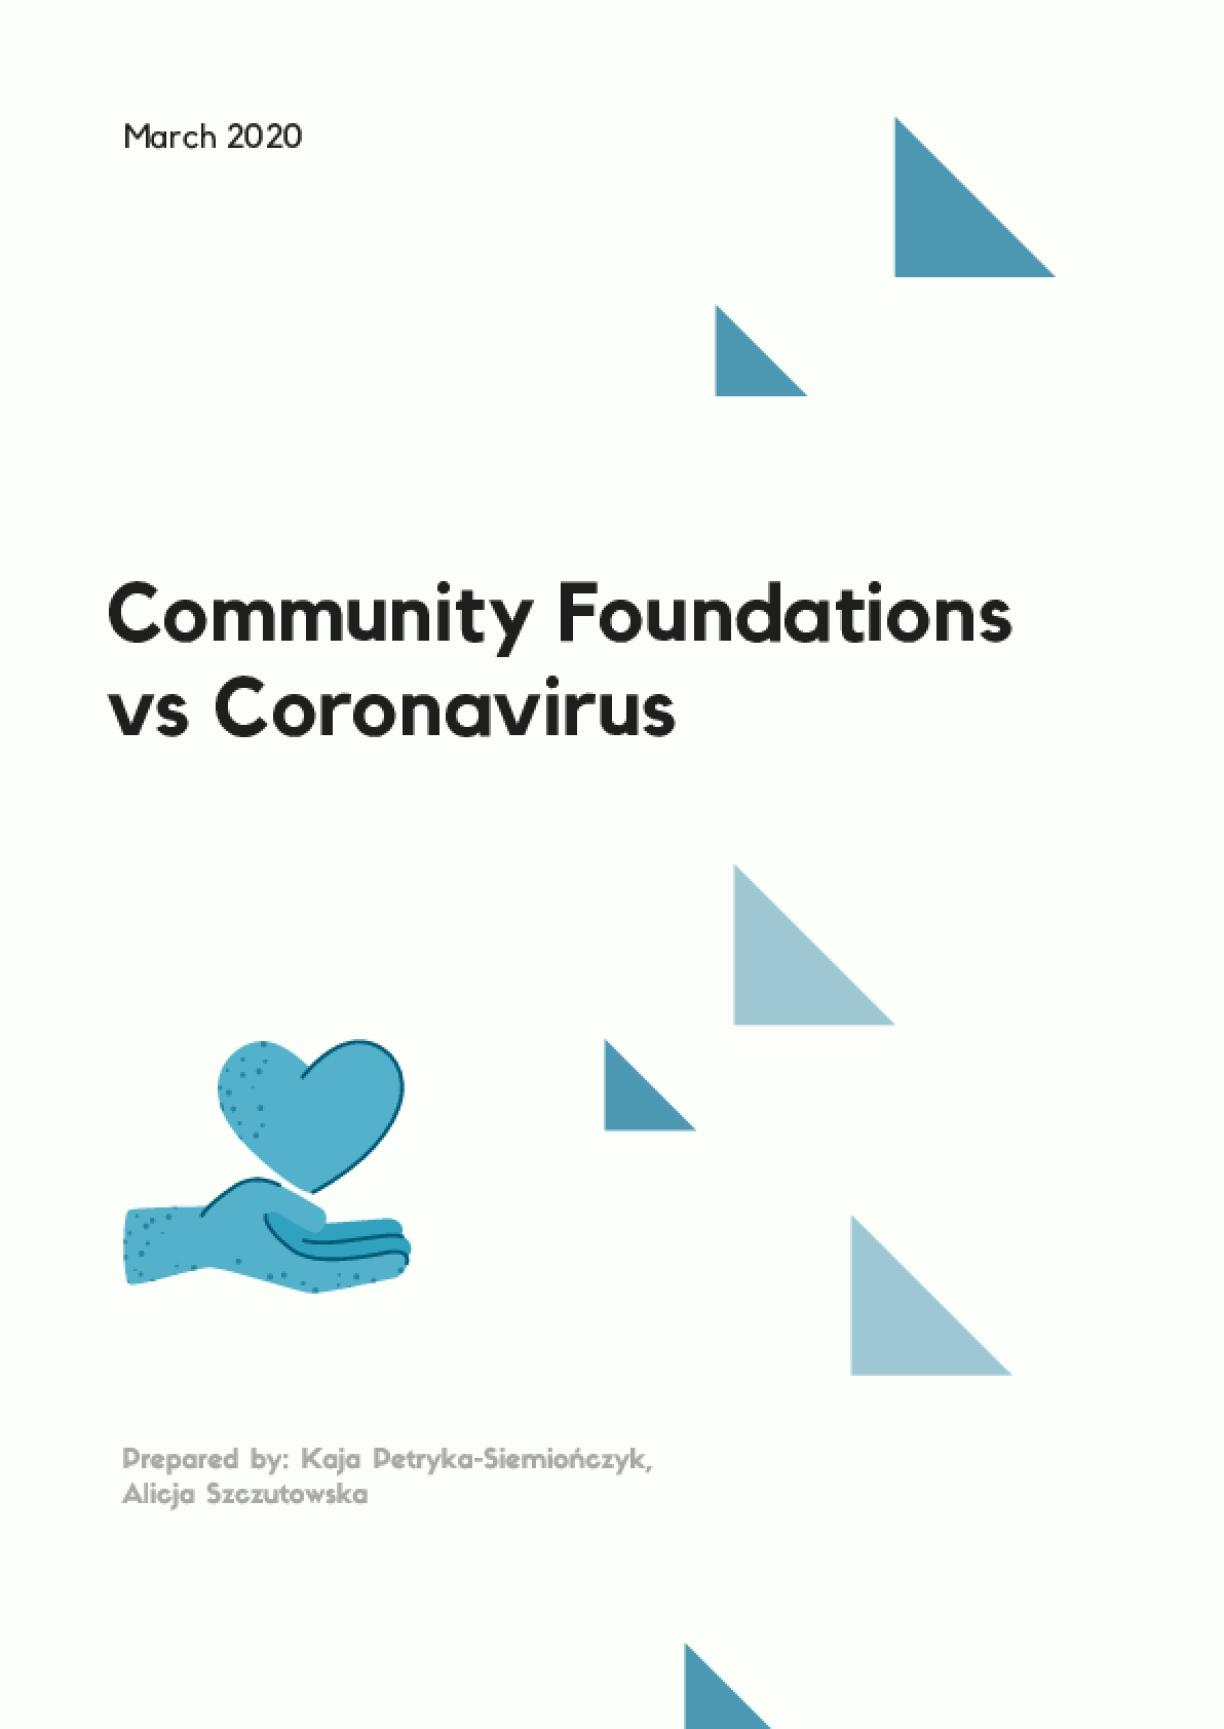 Community Foundations vs Coronavirus